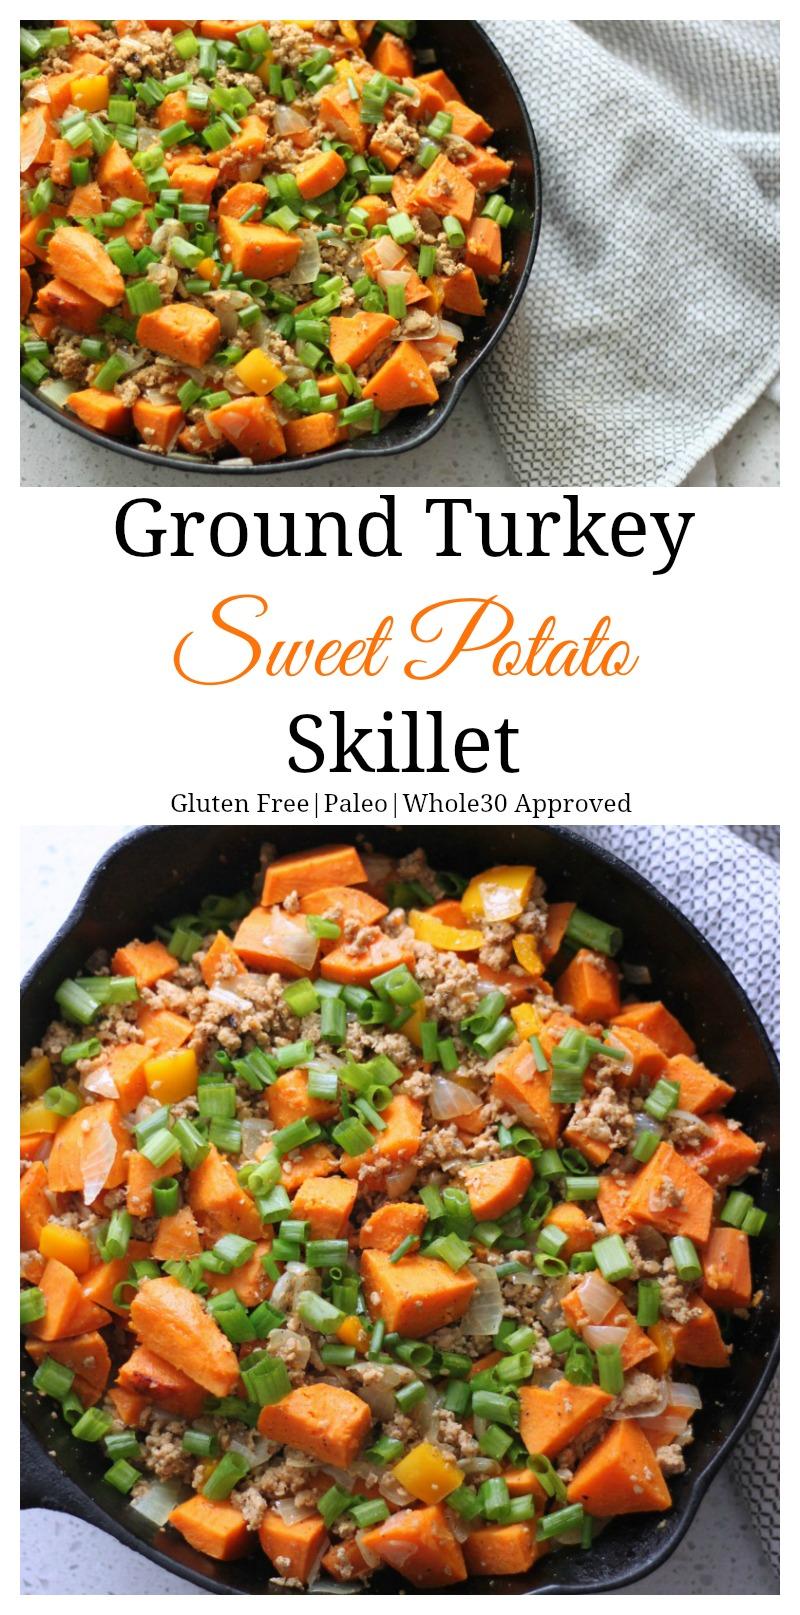 Ground turkey sweet potato skillet. Your family will love this nutritious meal that takes less than 30 minutes to make. #AD #paleo #healthy #sweetpotato #groundturkey